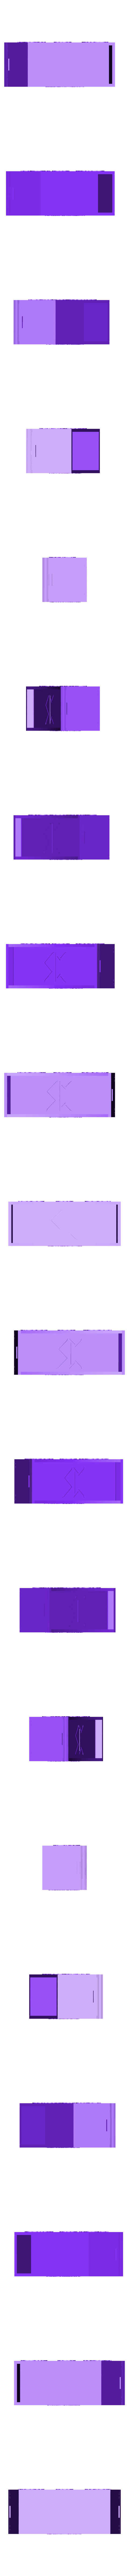 MVC_Box_FantasyModel.stl Download free STL file Viking Chest - Hedeby and fantasy version • 3D printable design, Snorri